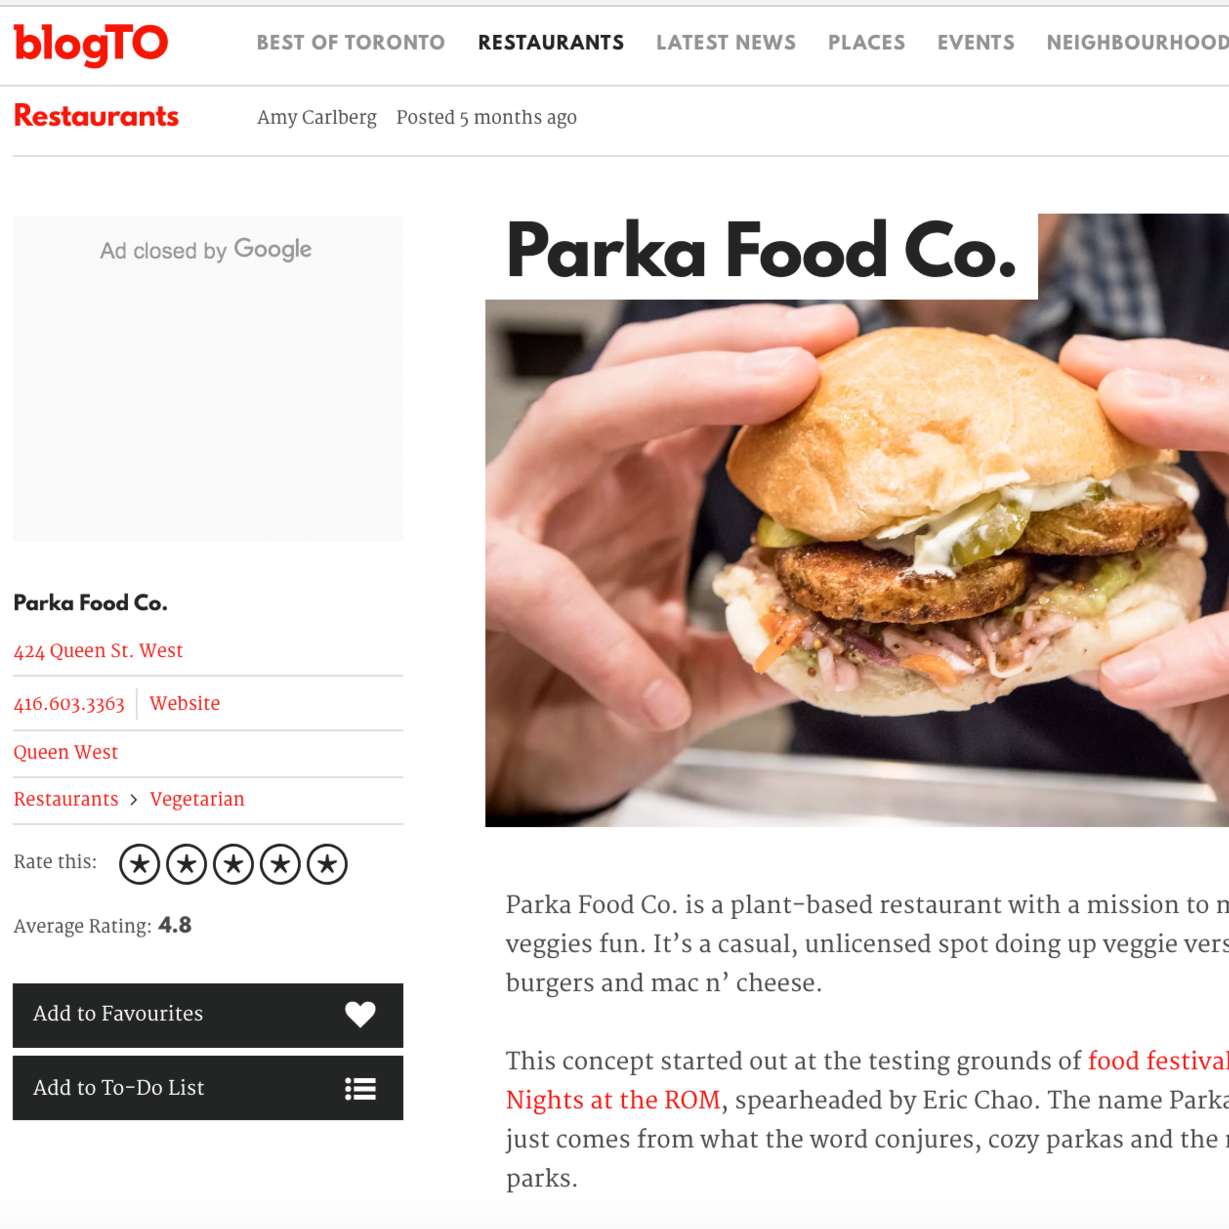 blogTo reviews Parka Food Co, Vegan comfort food, best vegan burger toronto, delicious vegan burger toronto, vegan food near me